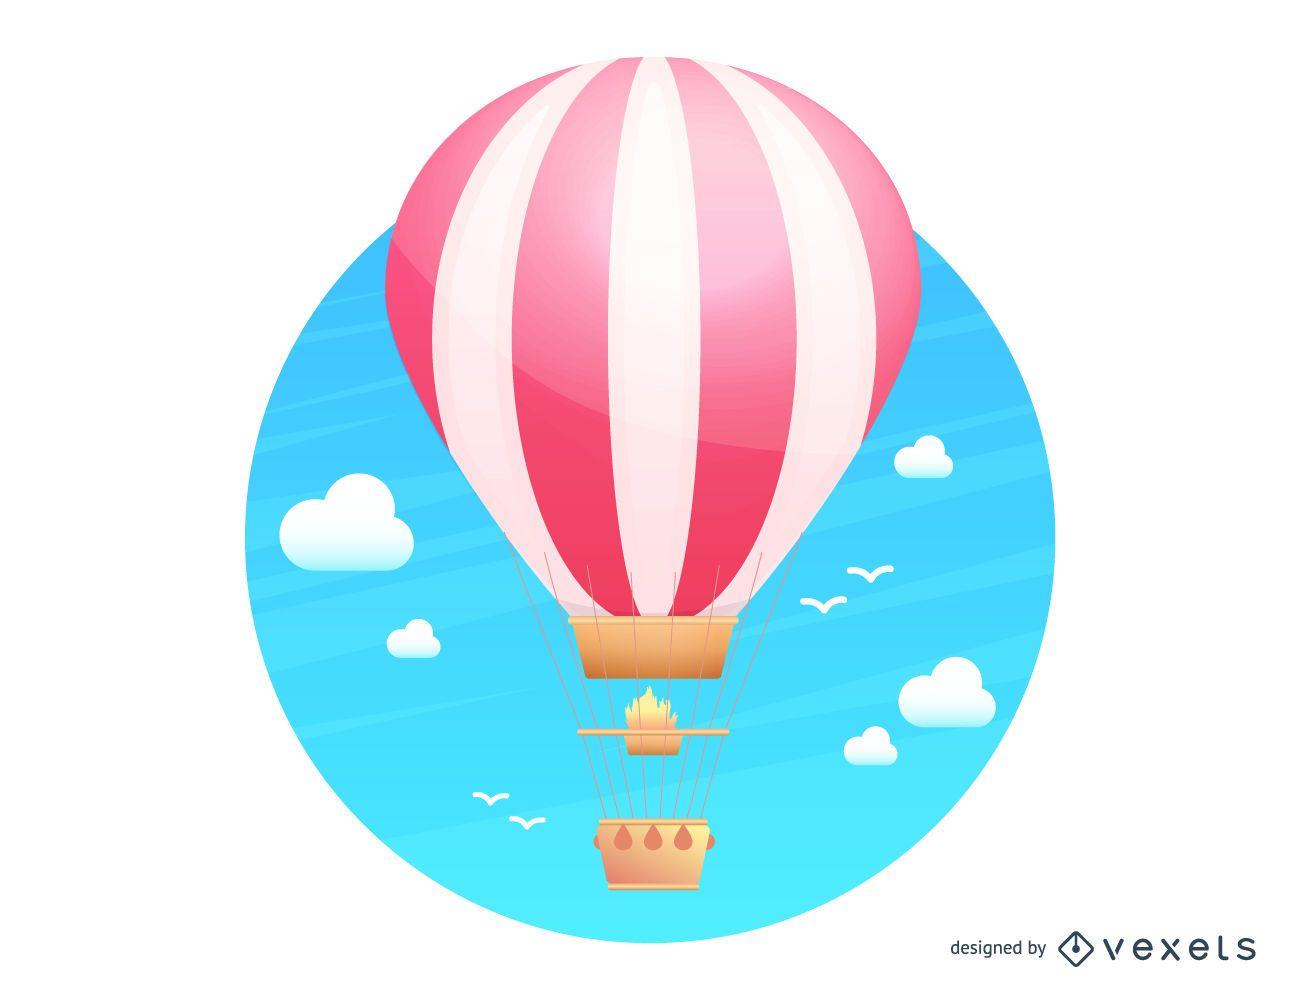 Hot air balloon flying illustration